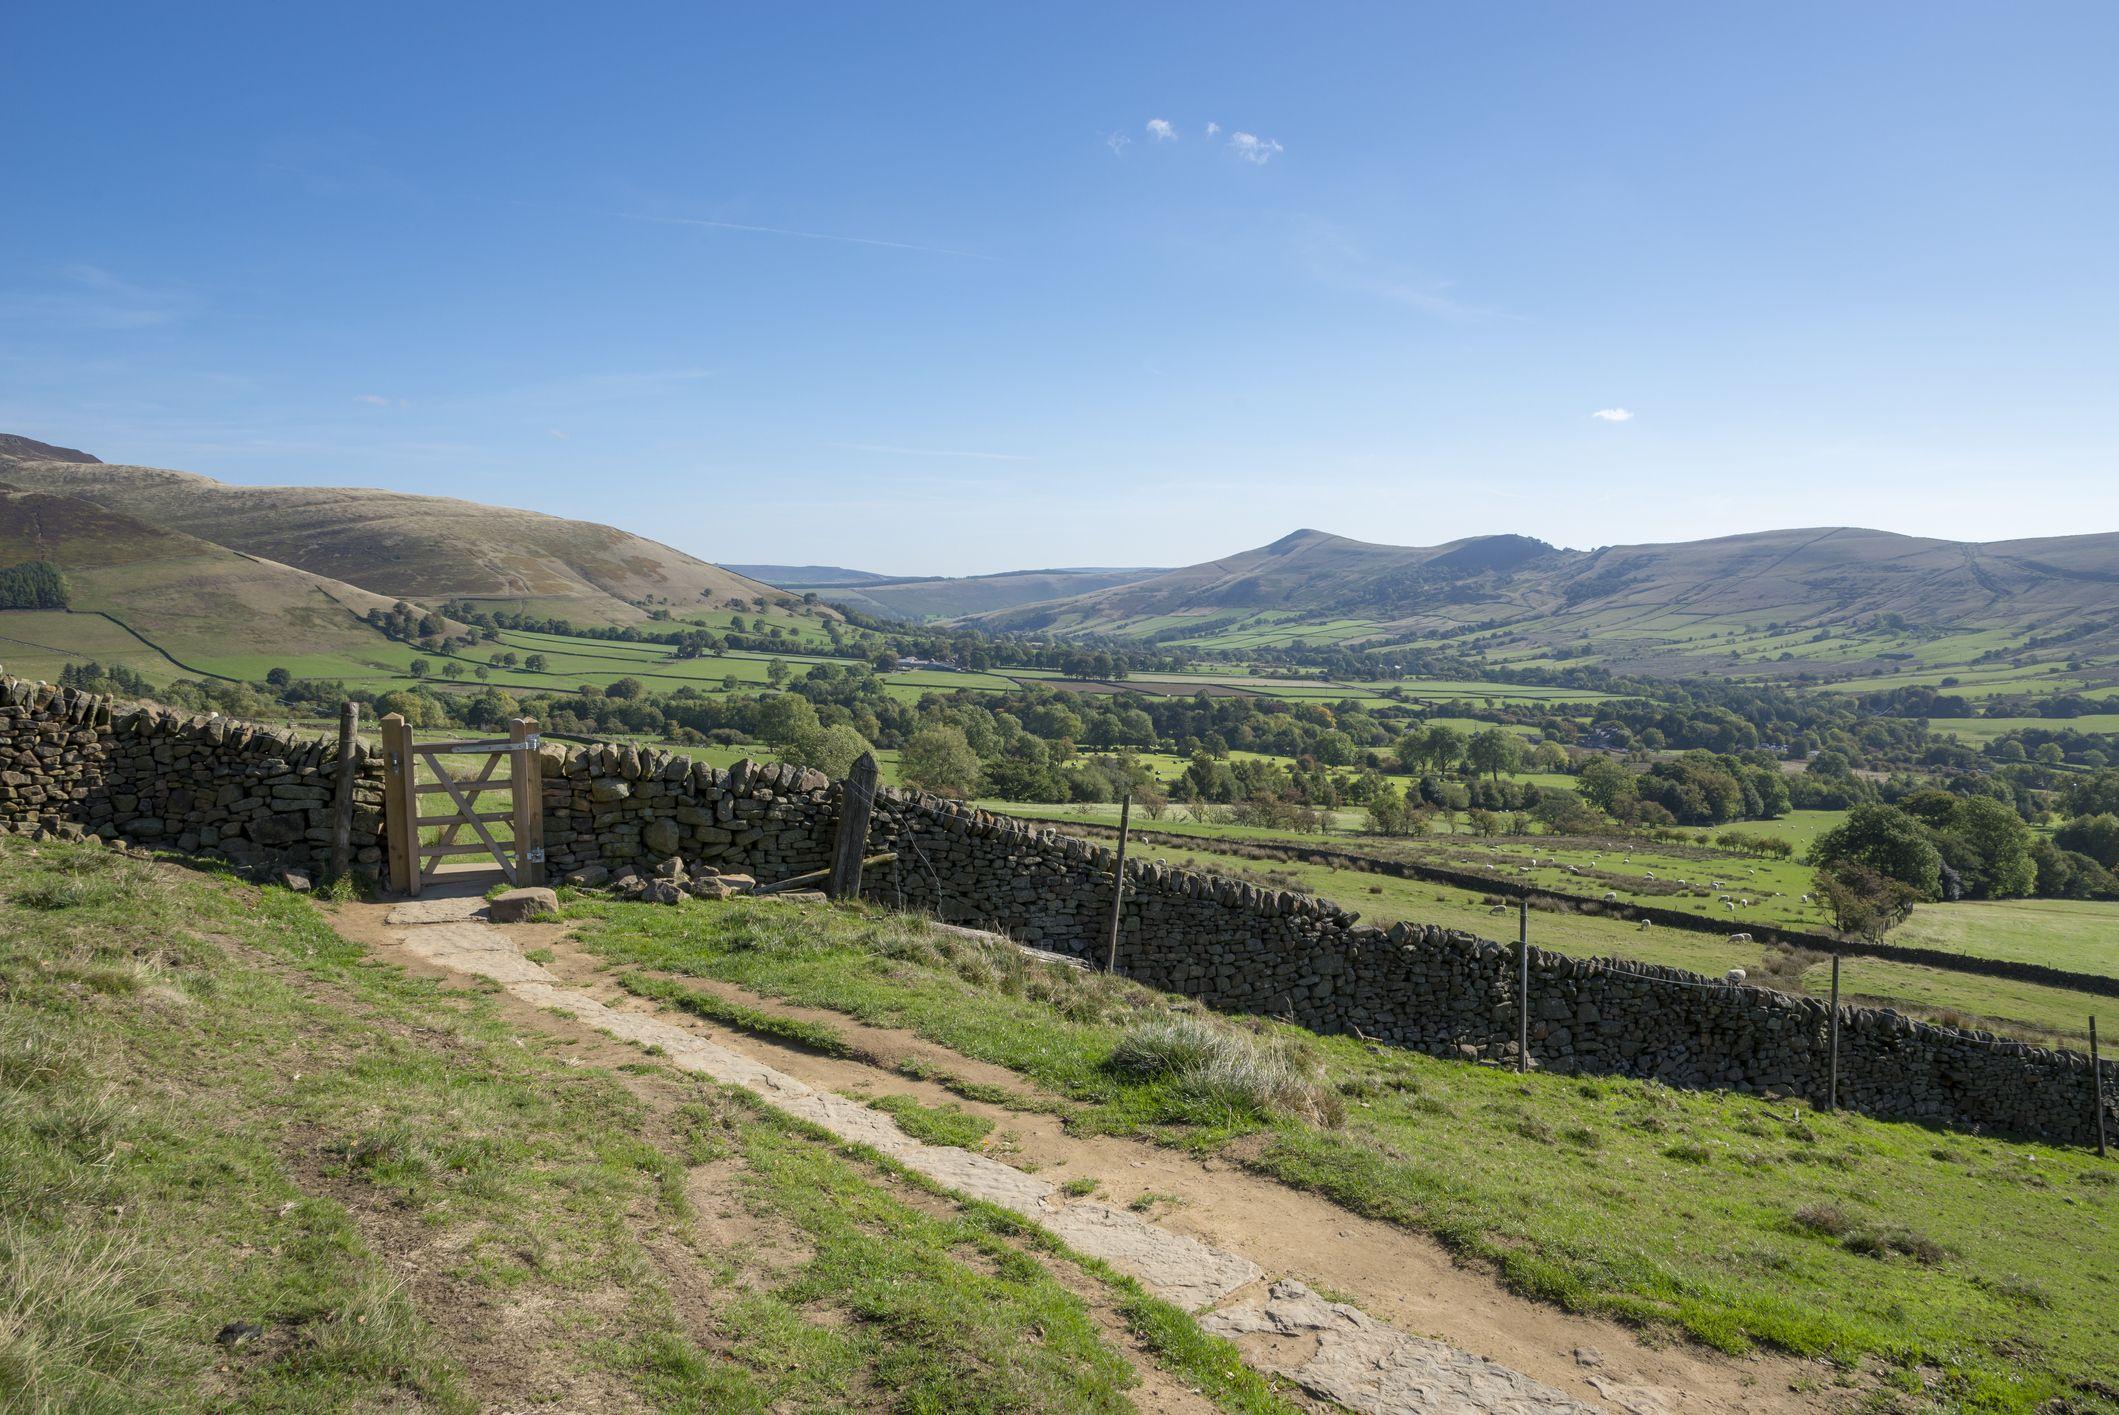 The Pennine Way at Edale, Peak District, Derbyshire, England